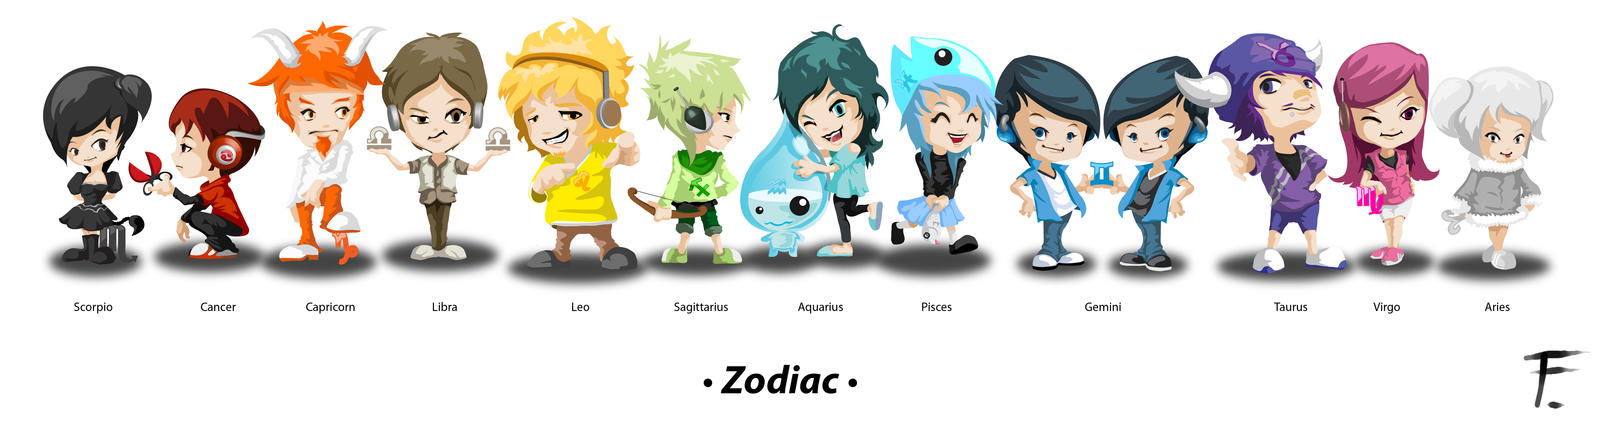 Zodiac by fer-fer